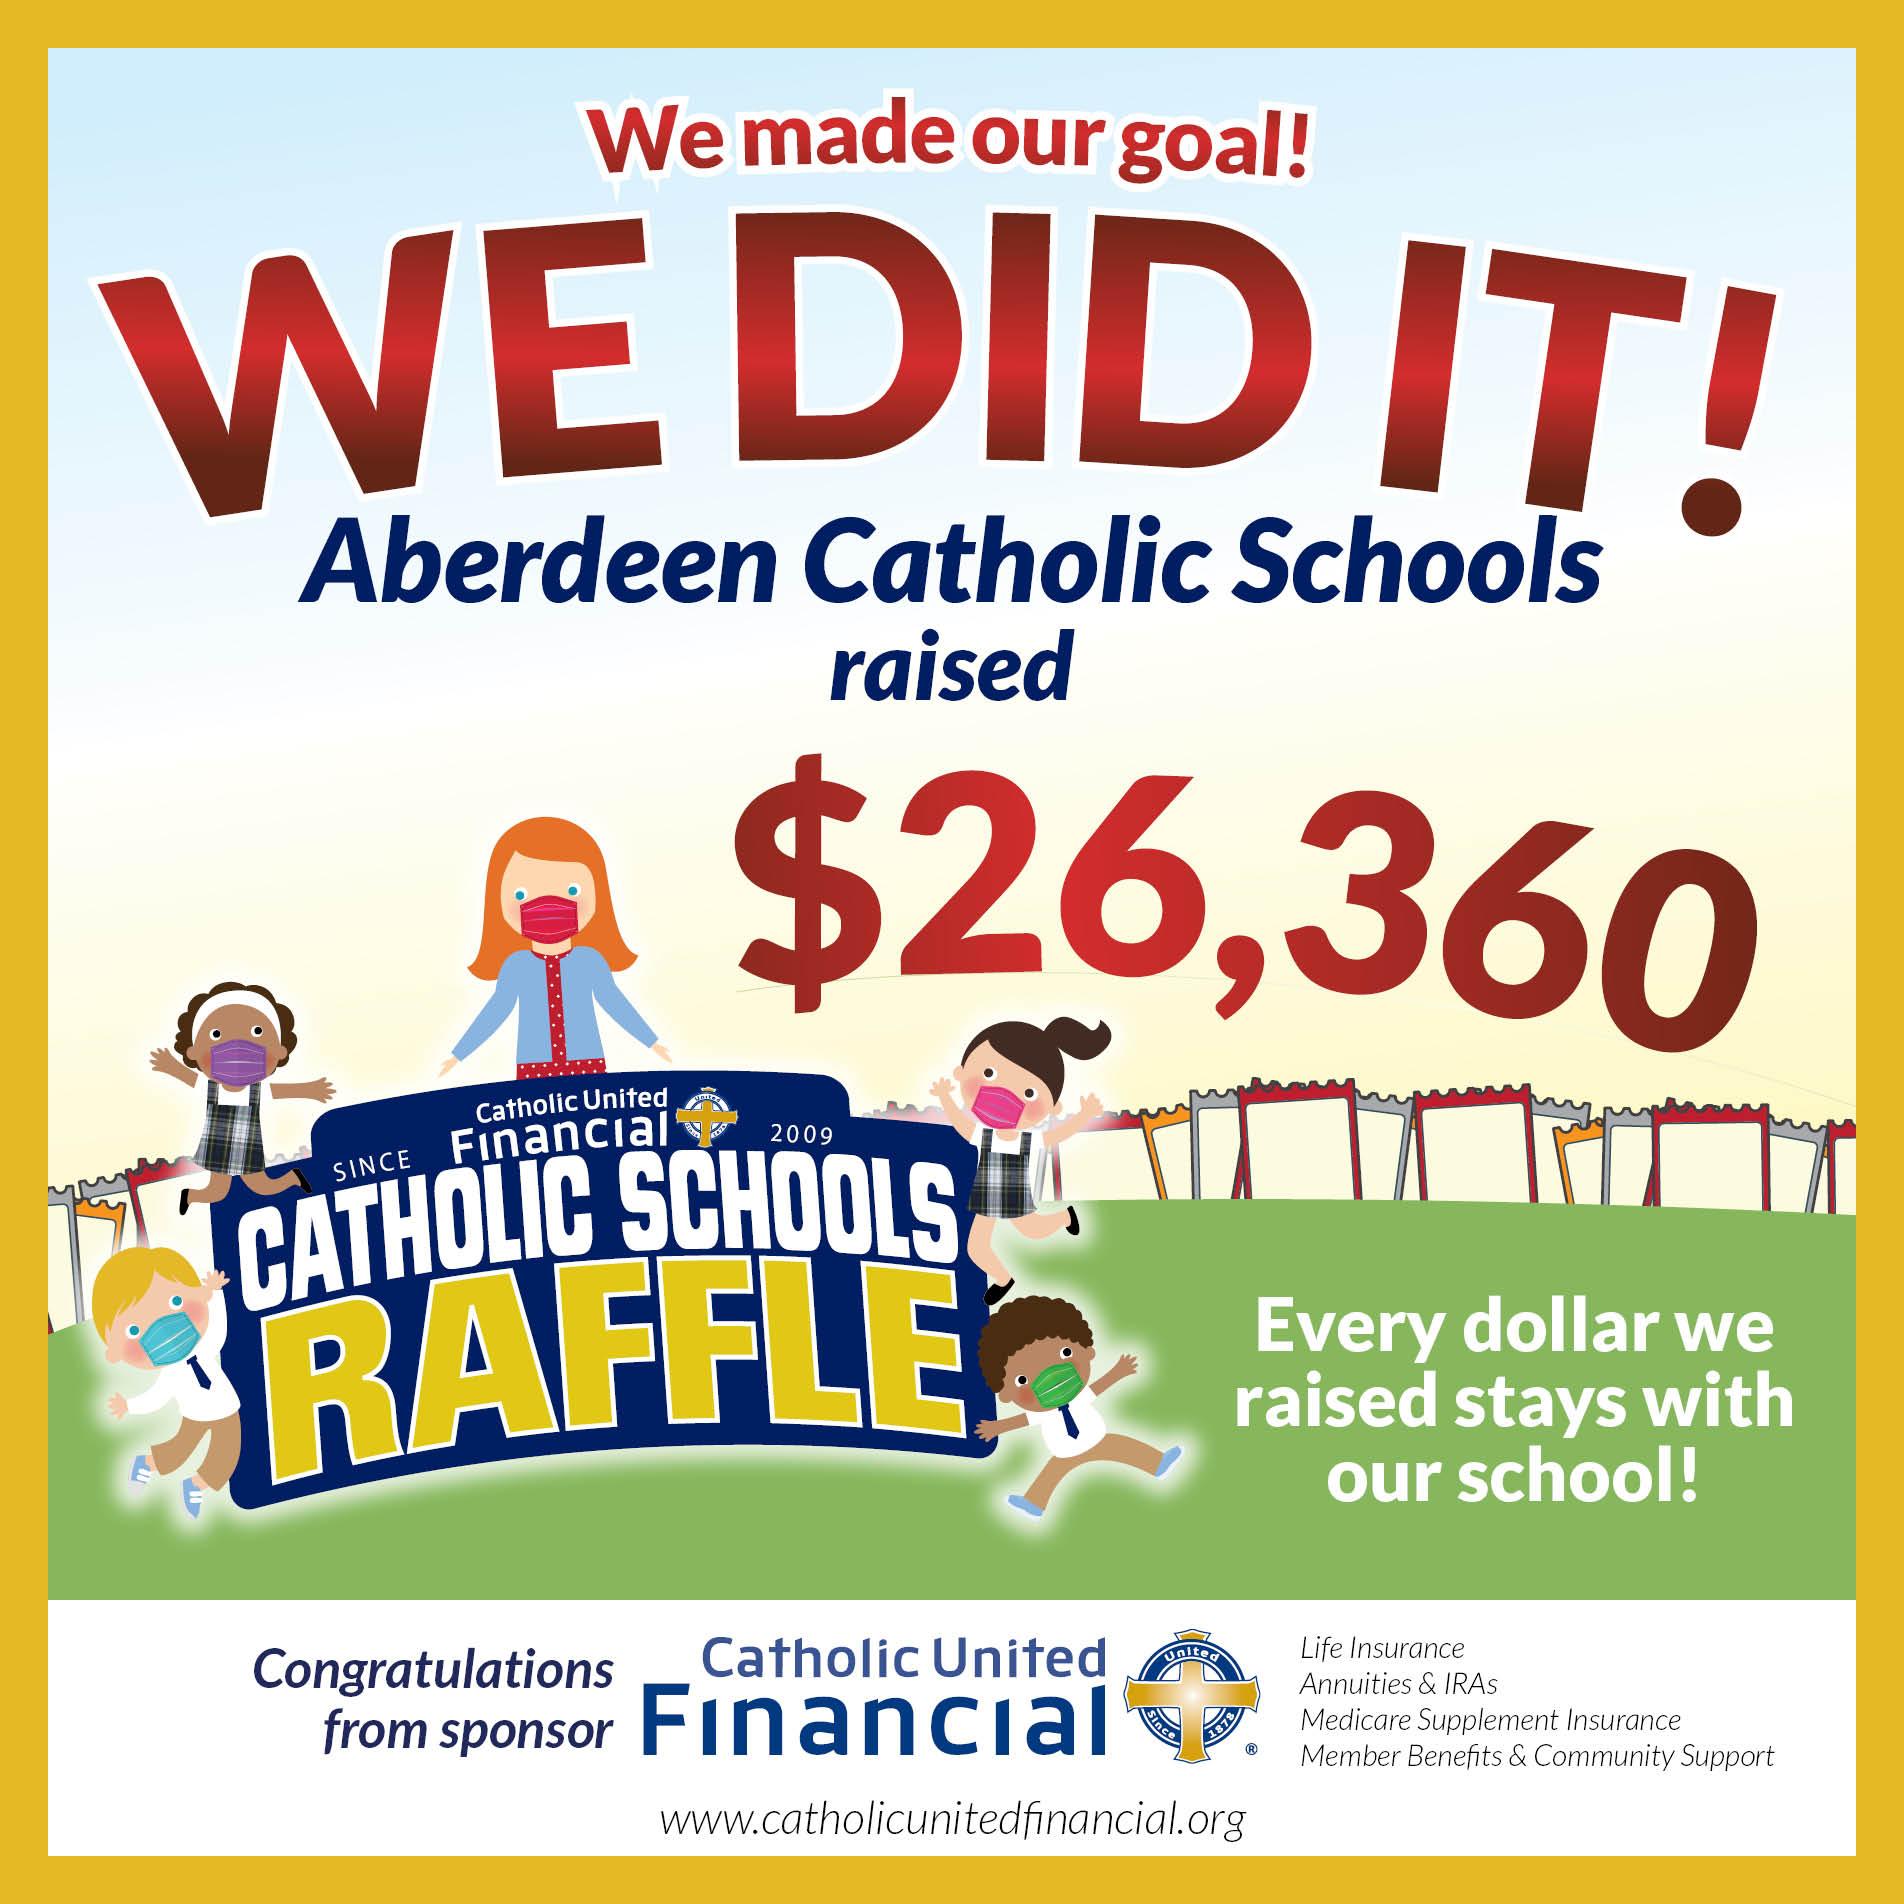 Catholic United Raffle - Thanks for helping us break our goal!